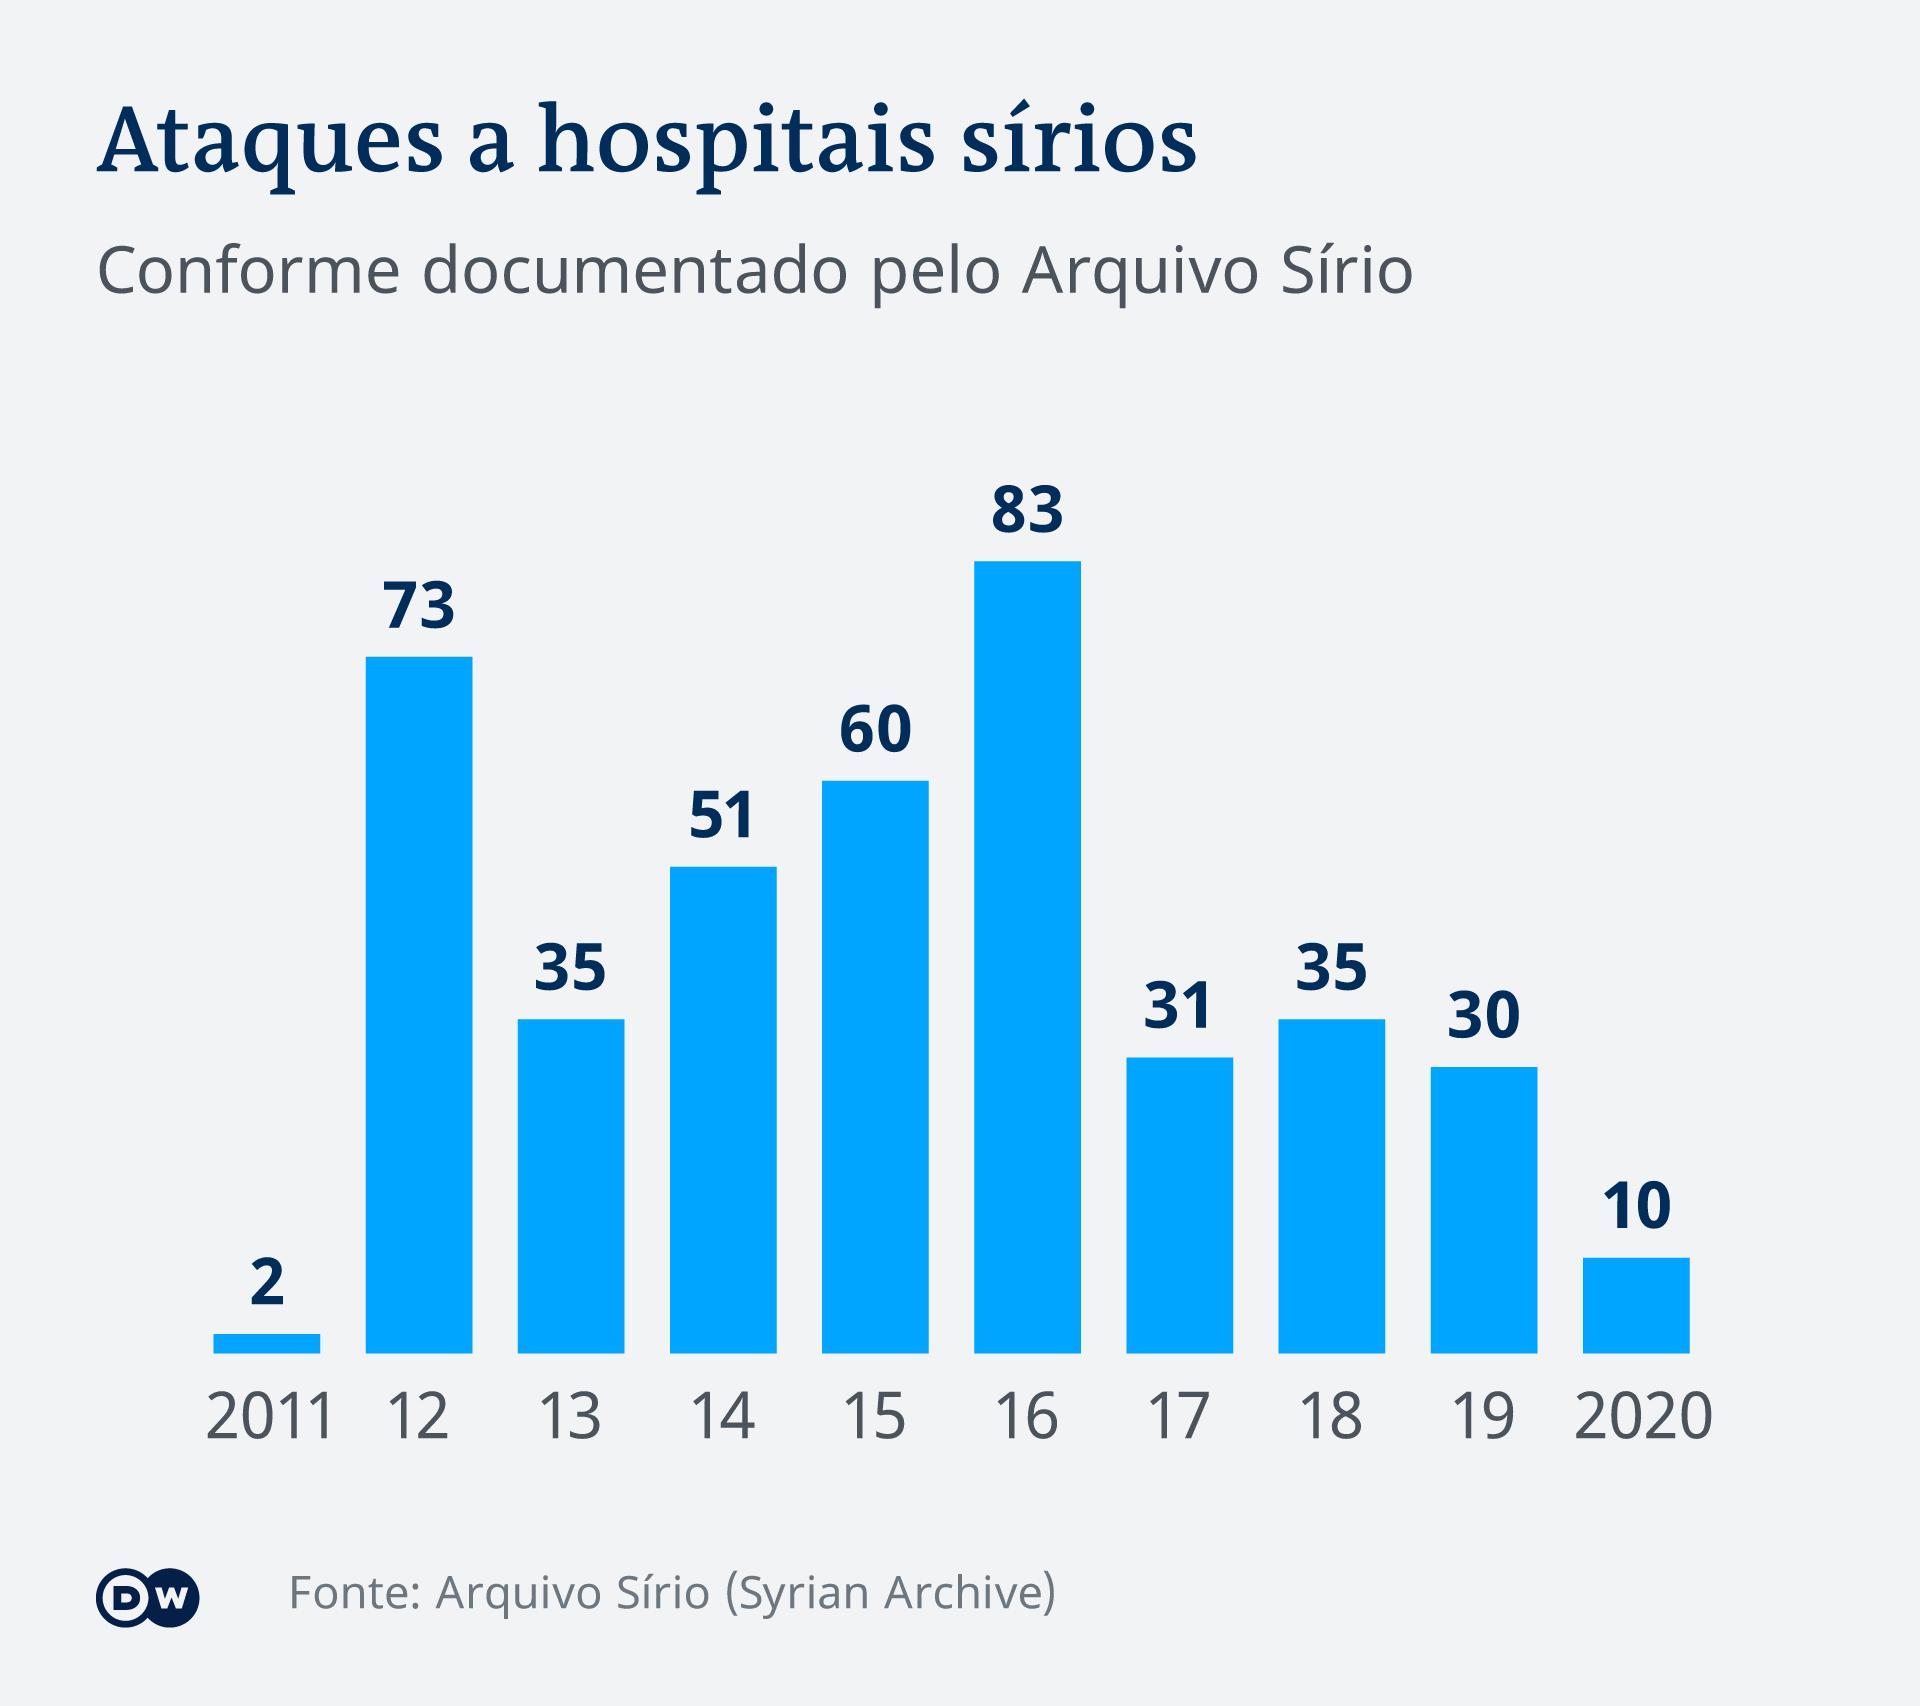 Ataques a hospitais sírios